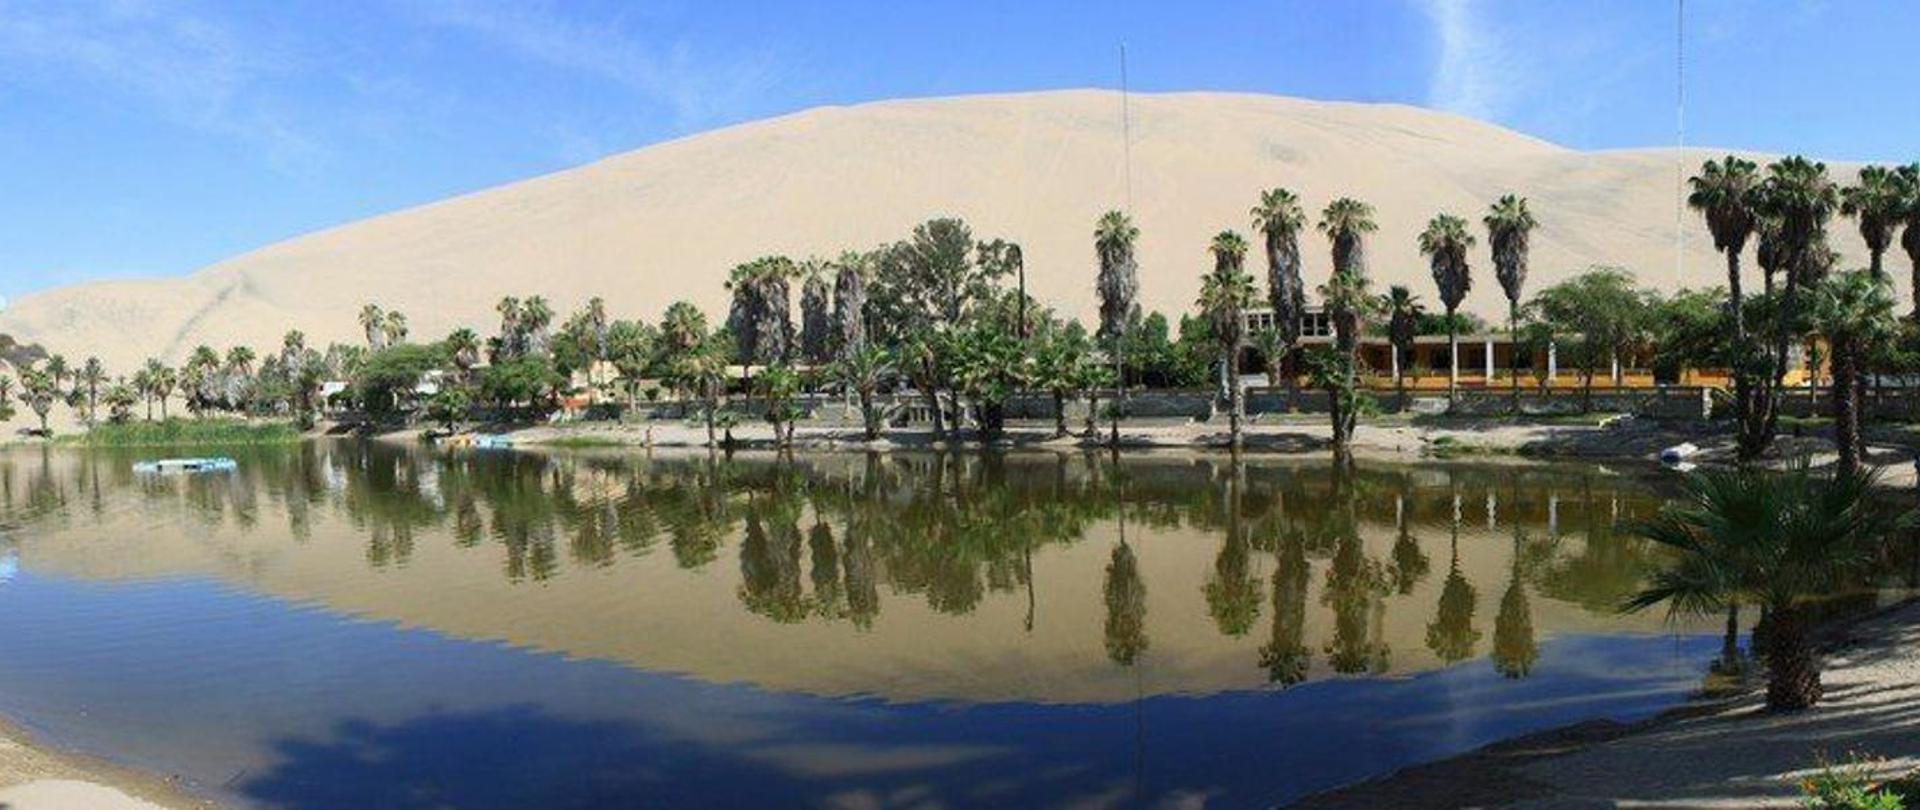 huacachina_sand_dune_oasis_peru2-2.jpg